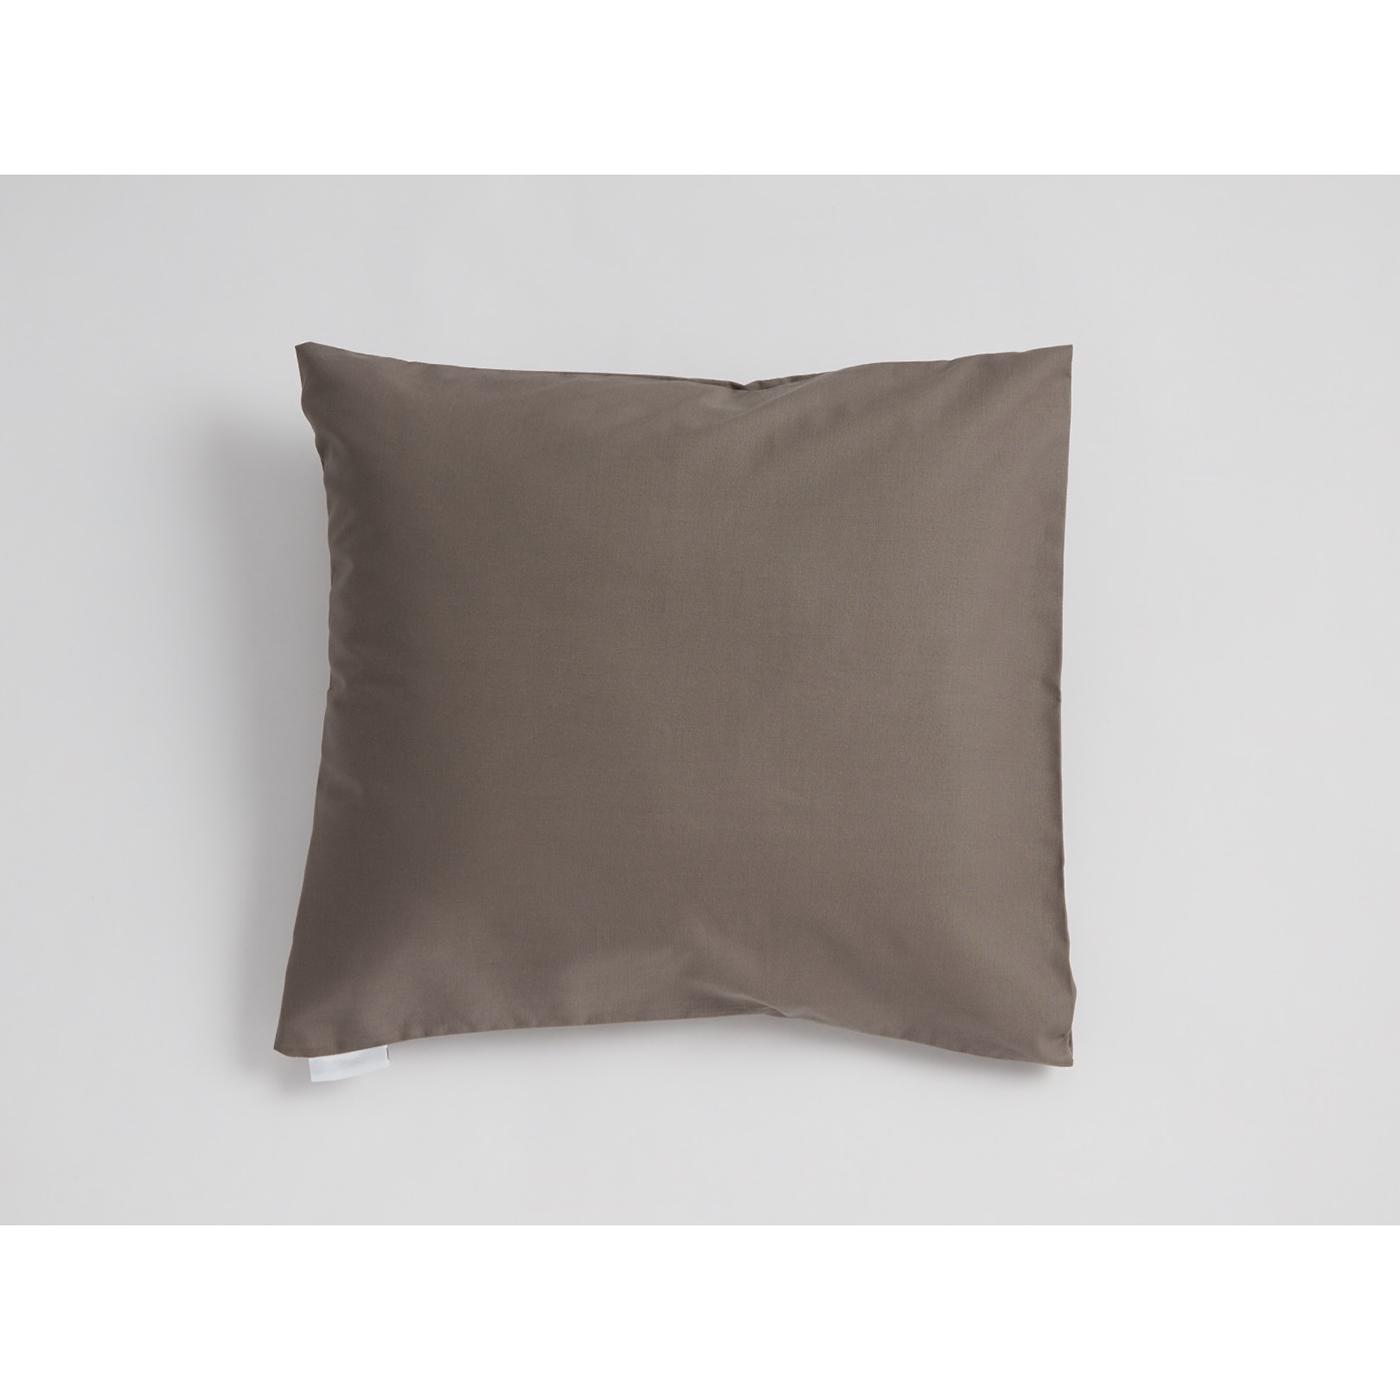 Mini Snoooze cotton pillowcase (Mocha)